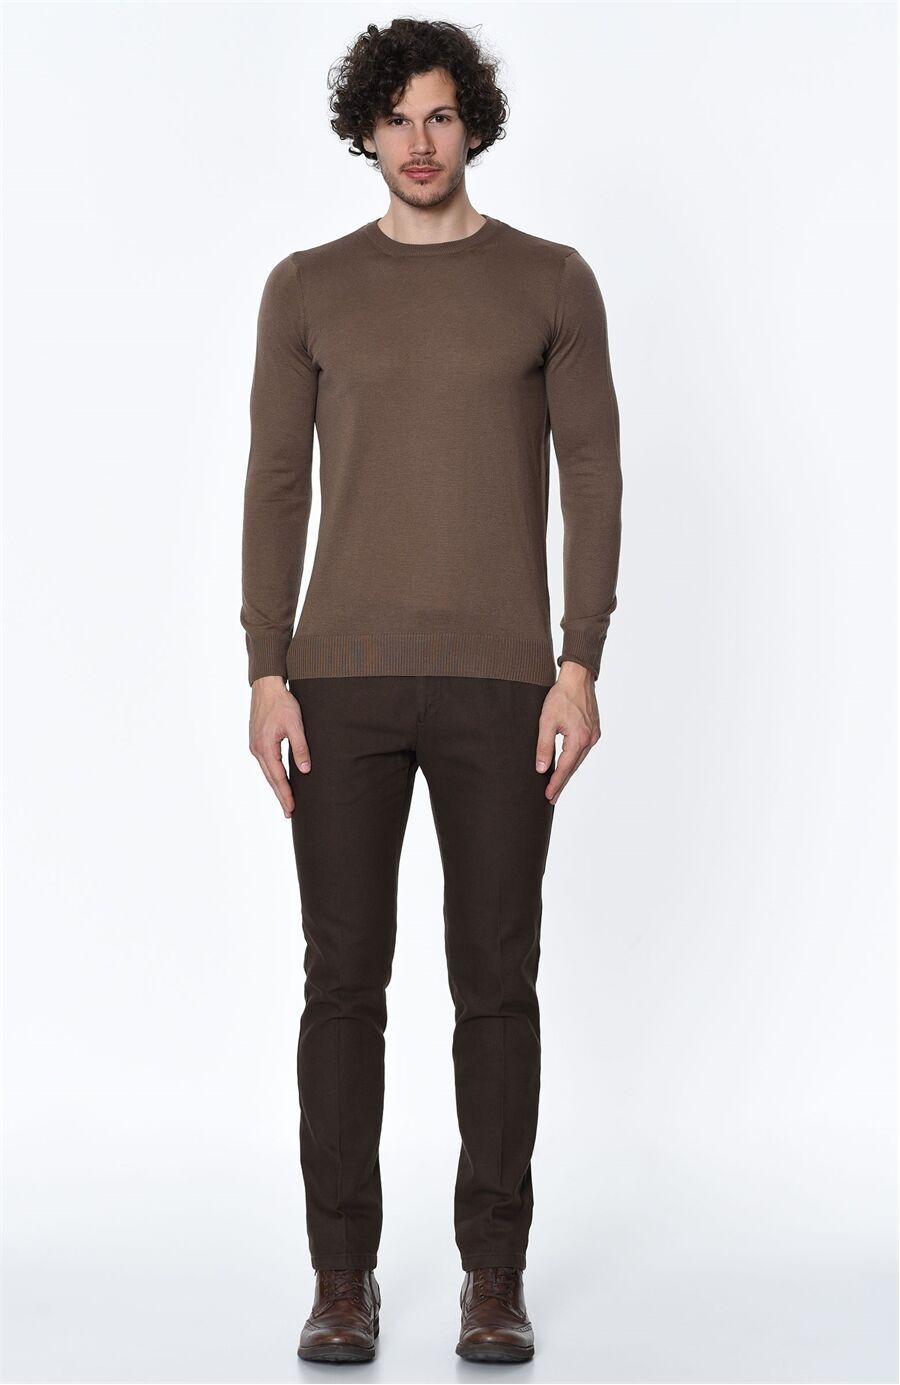 Diyagonal Rahat Kesim Fındık Rengi Pantolon